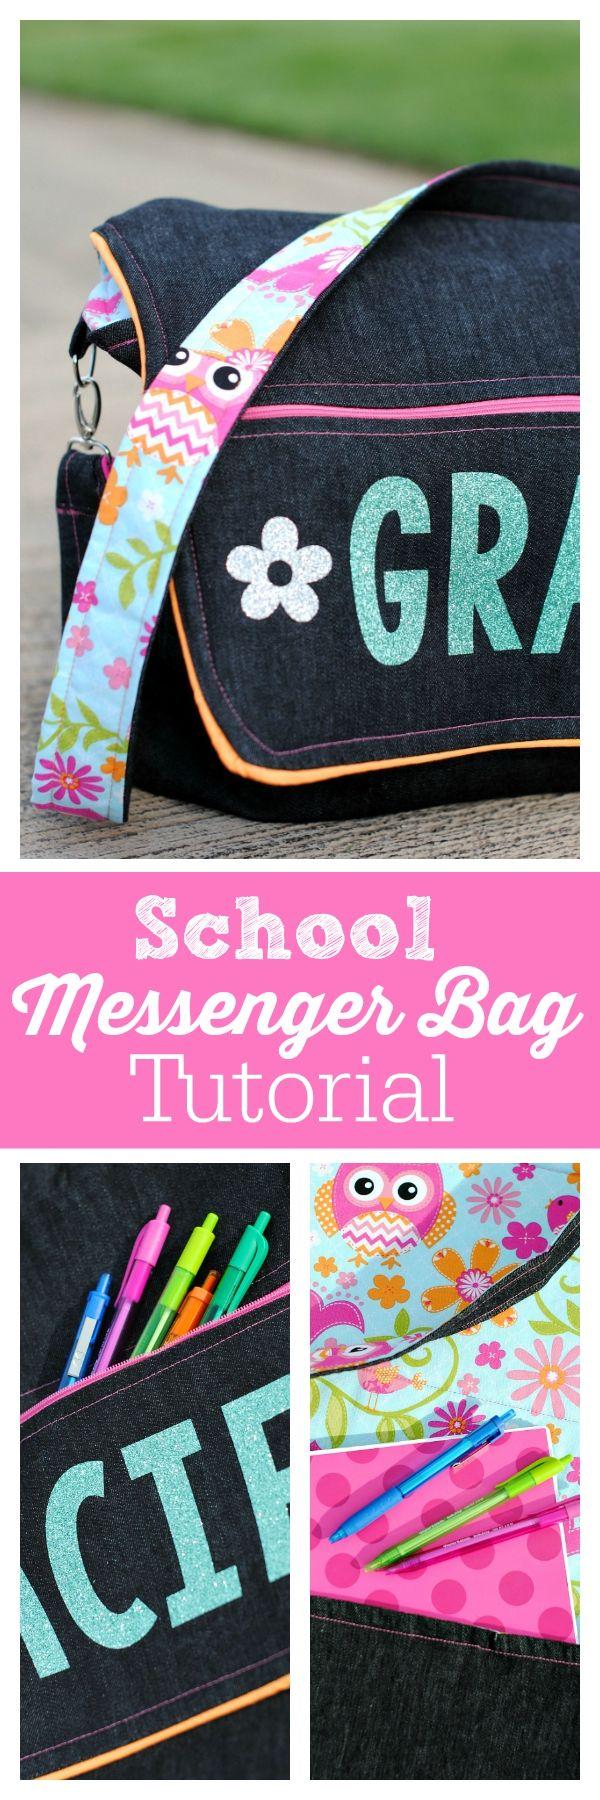 Messenger Bag Tutorial-Perfect for school!